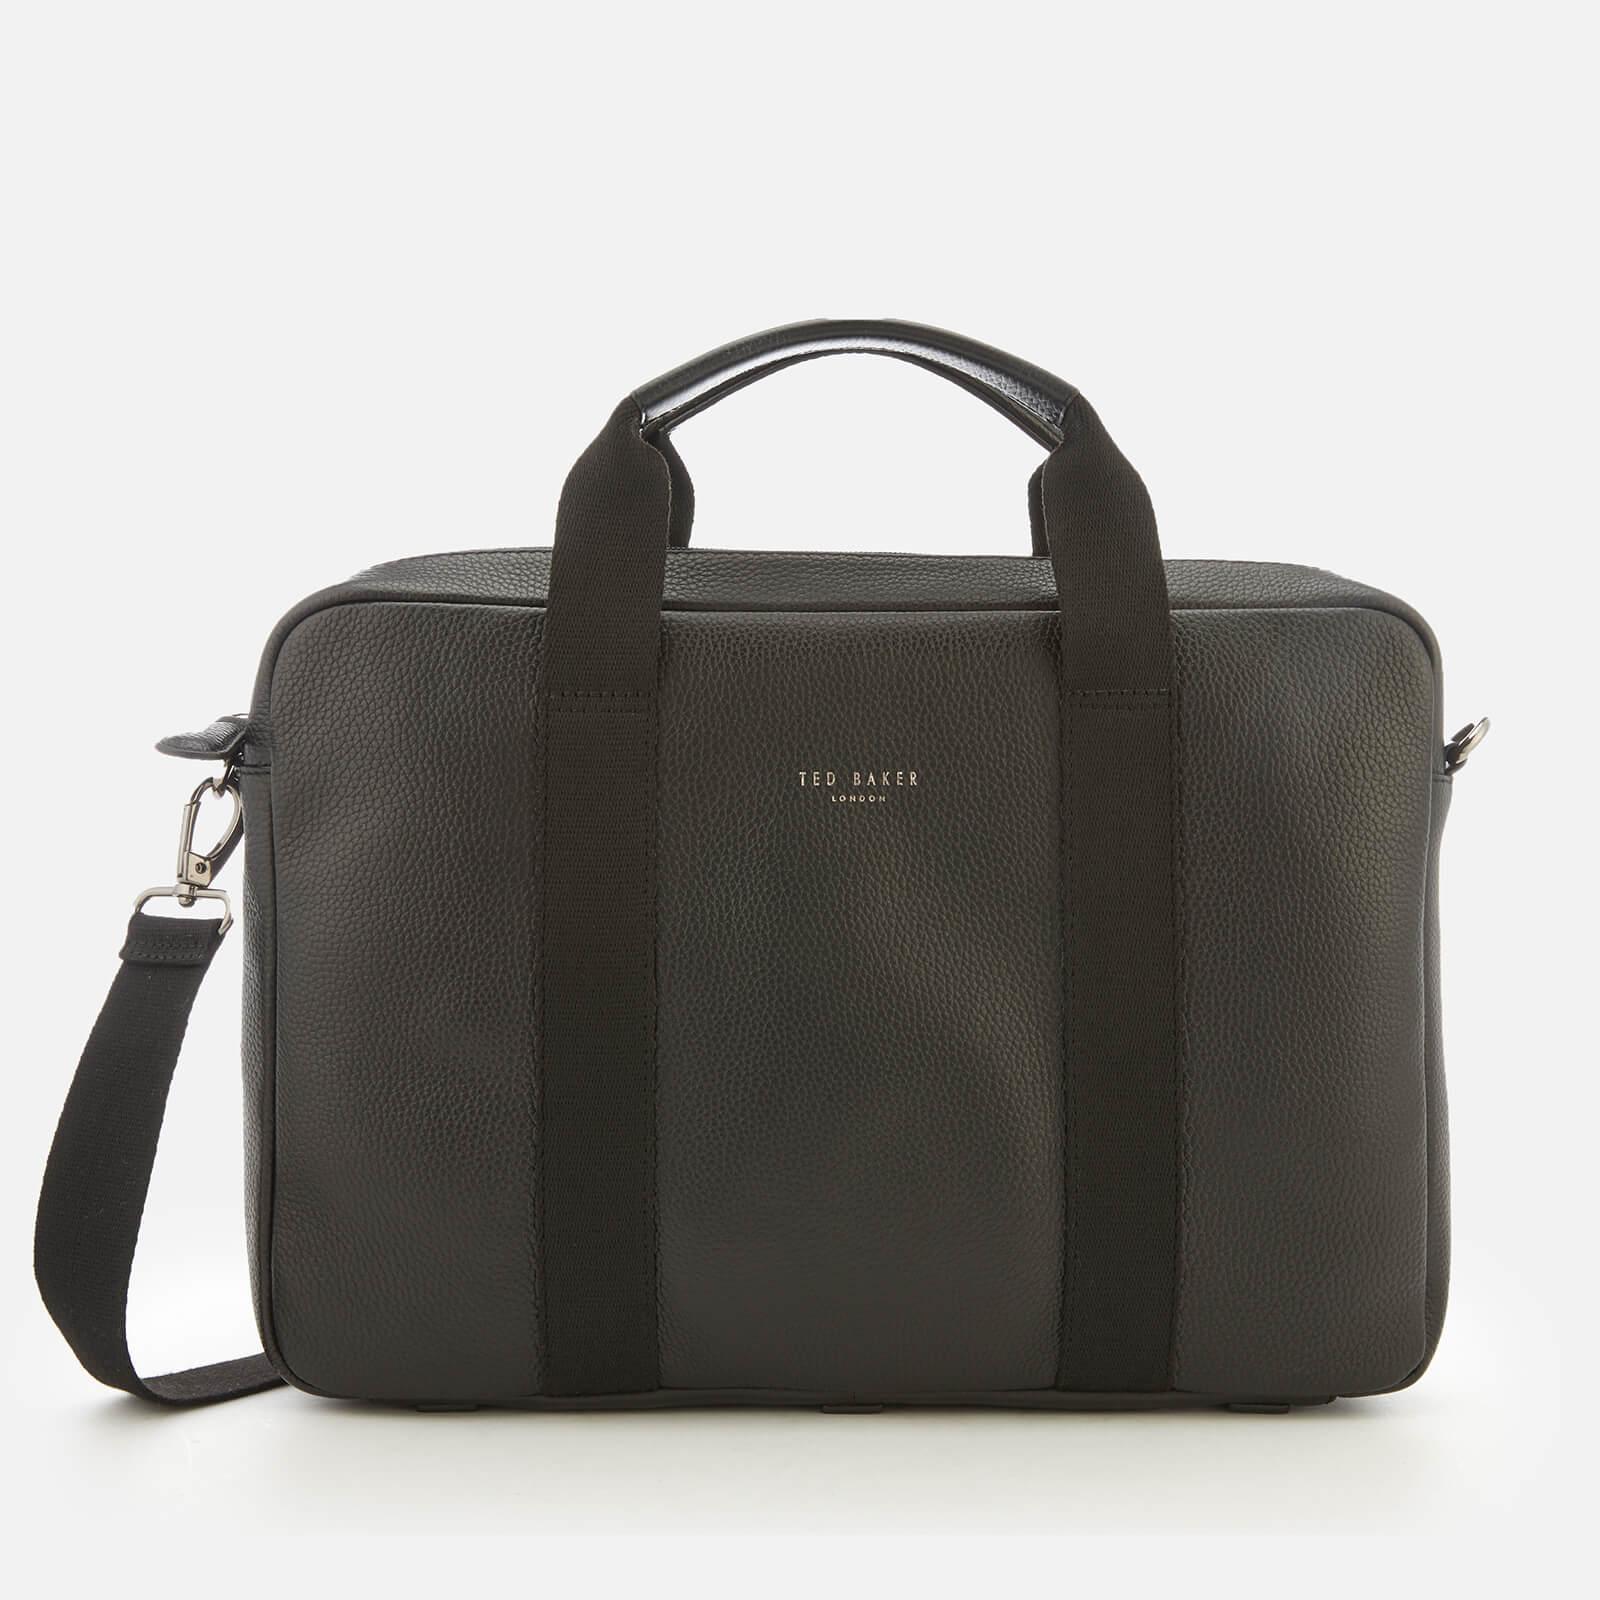 Ted Baker Men's Importa Leather Document Bag - Black